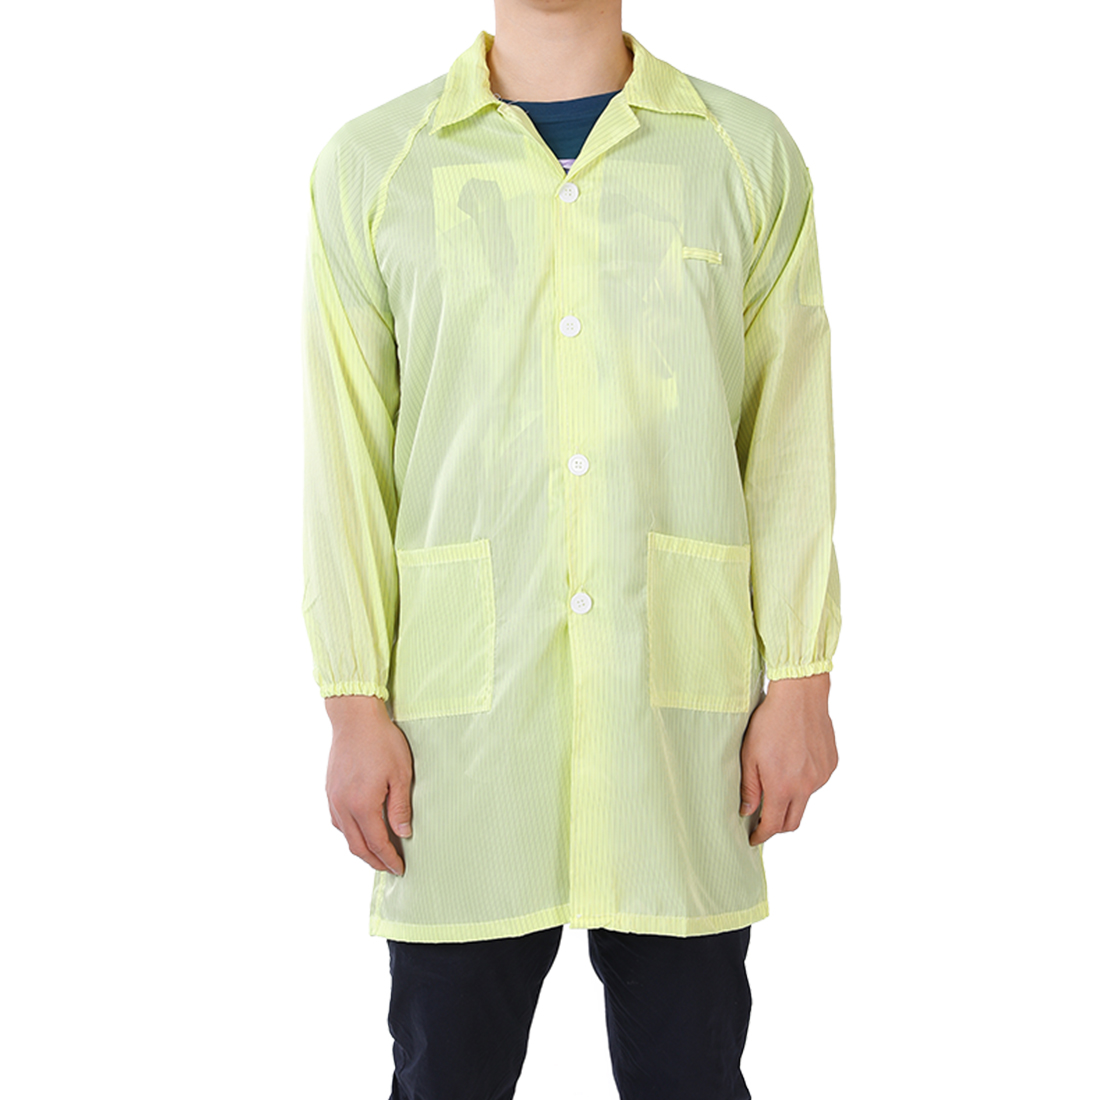 Anti Static Overalls Unisex ESD Lab Coat Button Up XXXL Yellow